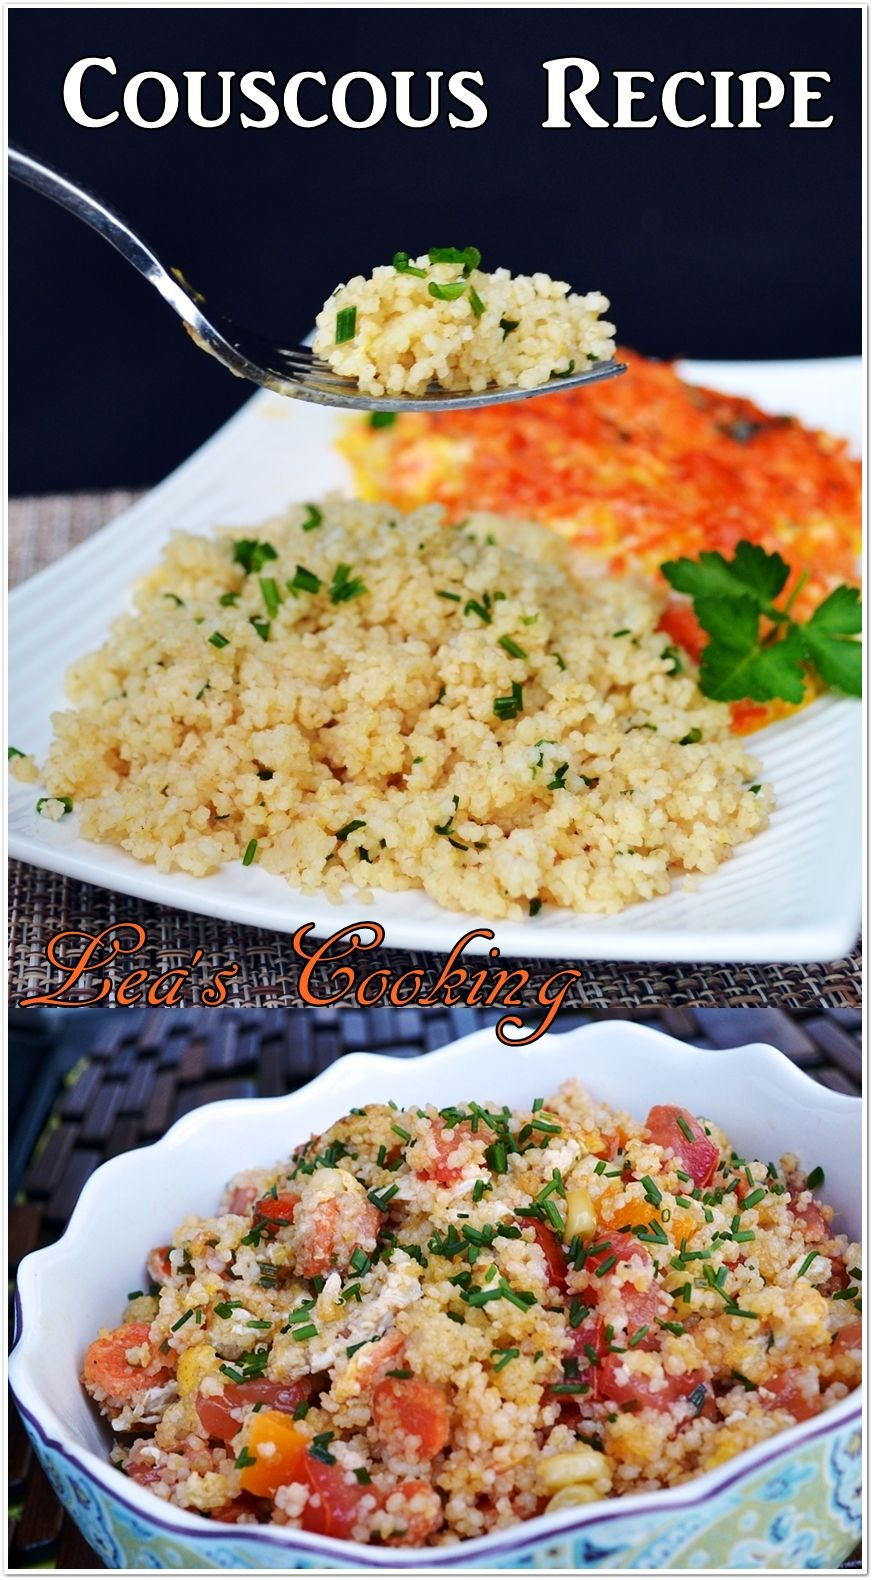 Lea's Cooking: Simple Couscous Recipe